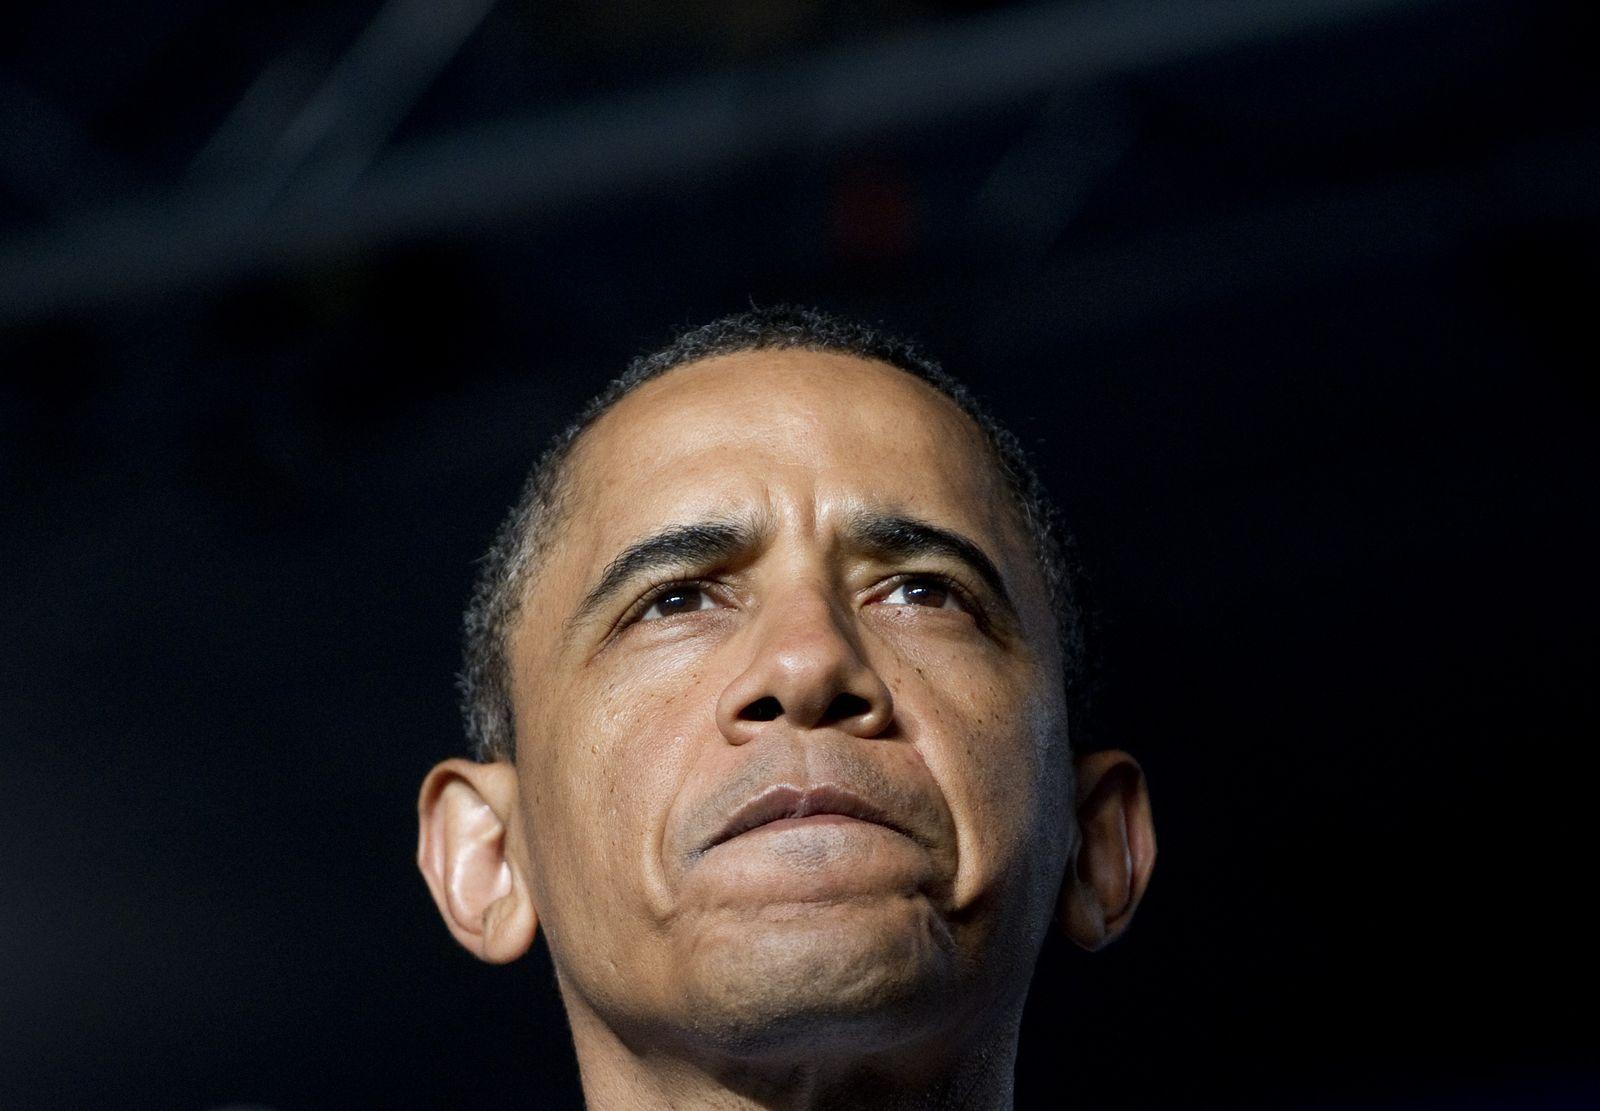 obama guckt skeptisch